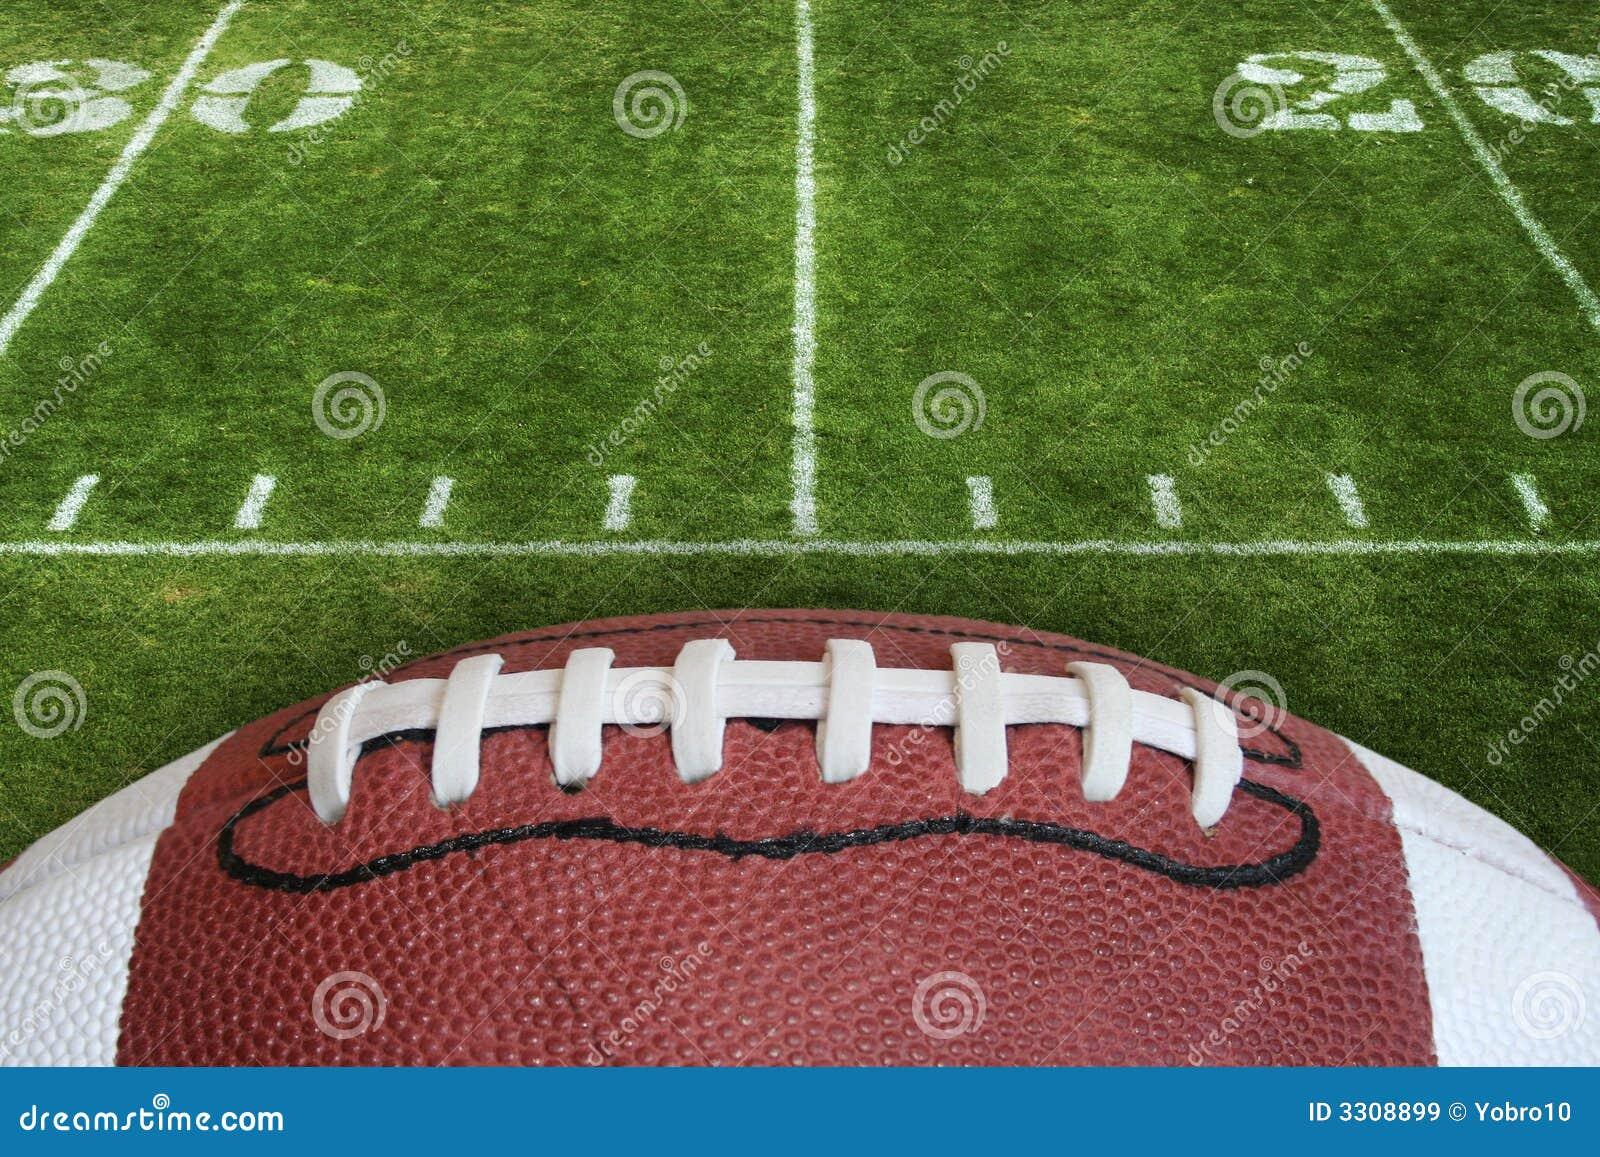 Le football et zone